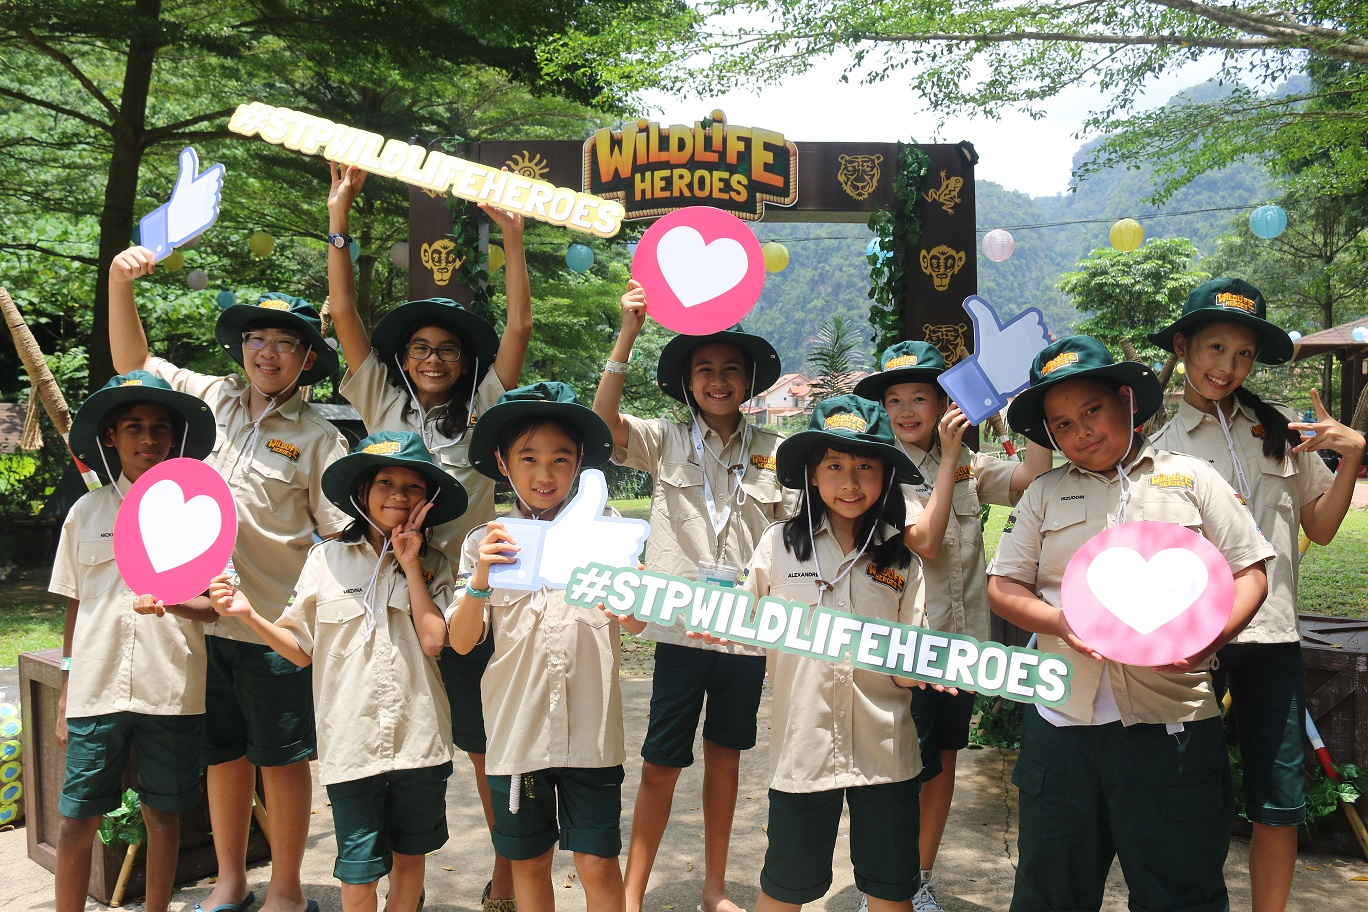 Sunway Theme Parks Wildlife Heroes